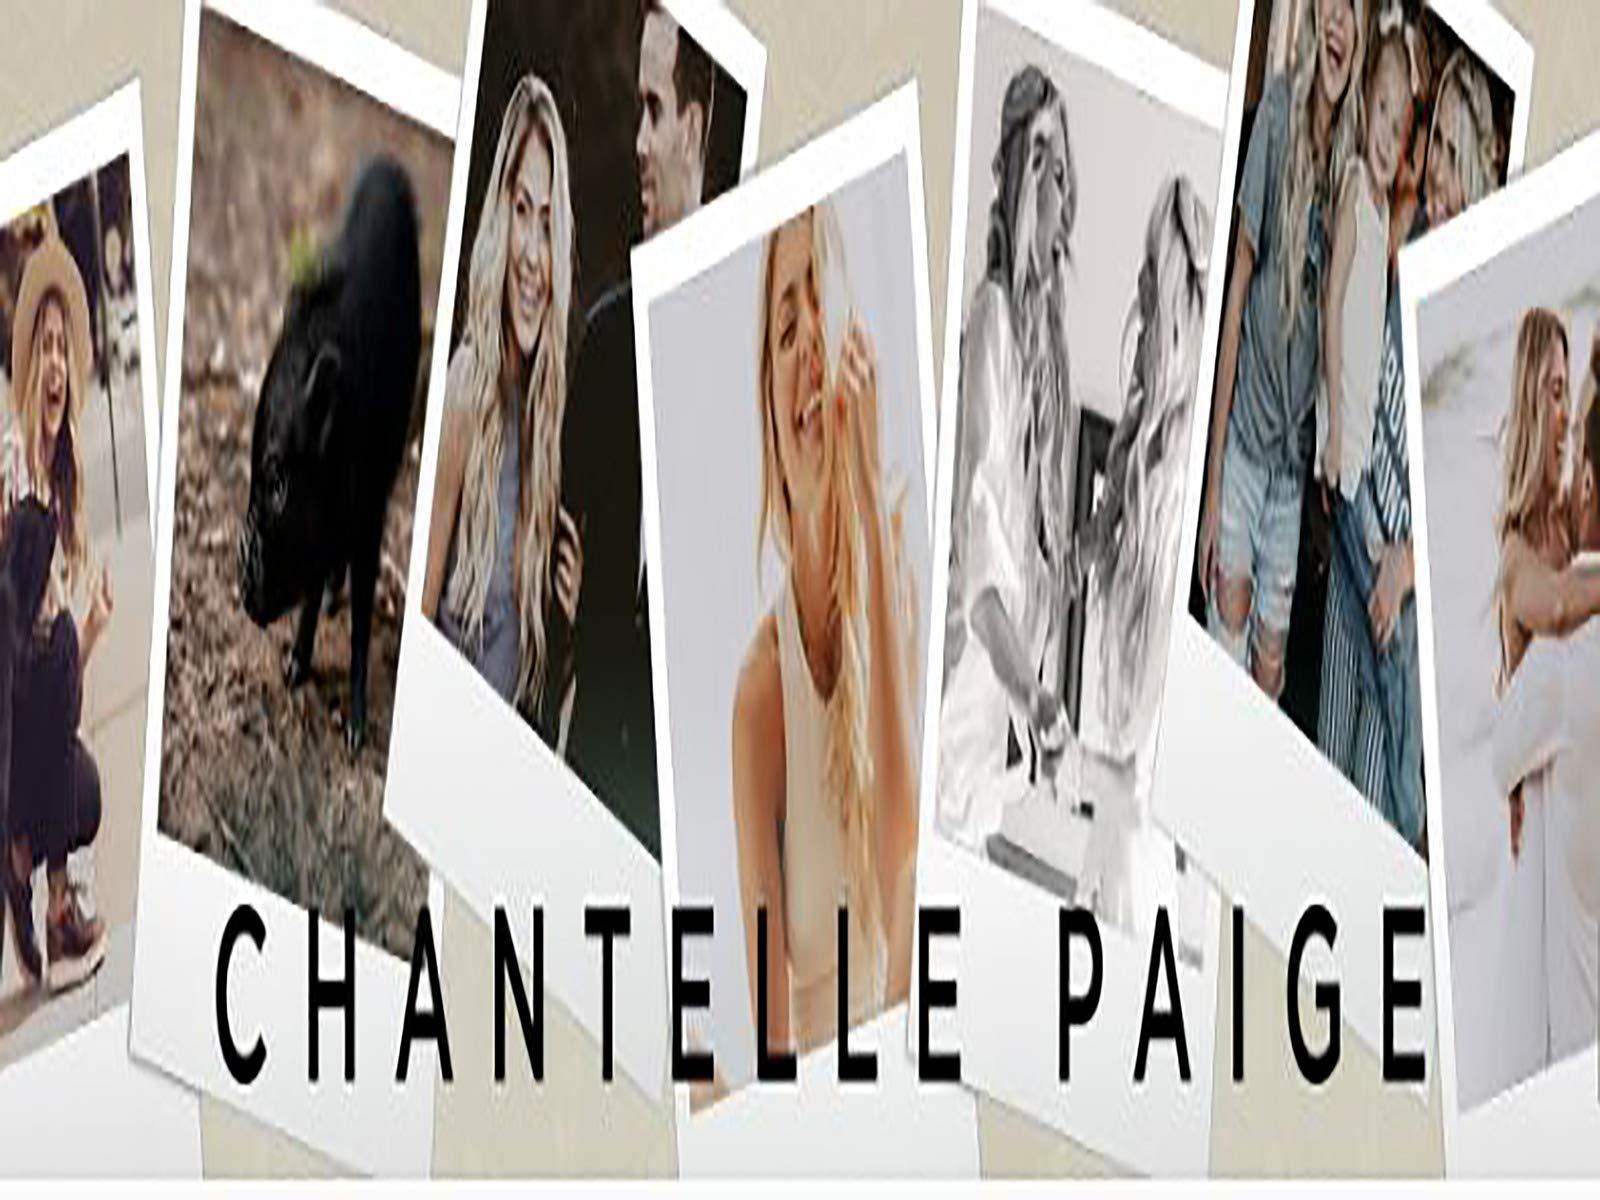 ChantellePaige - Season 1